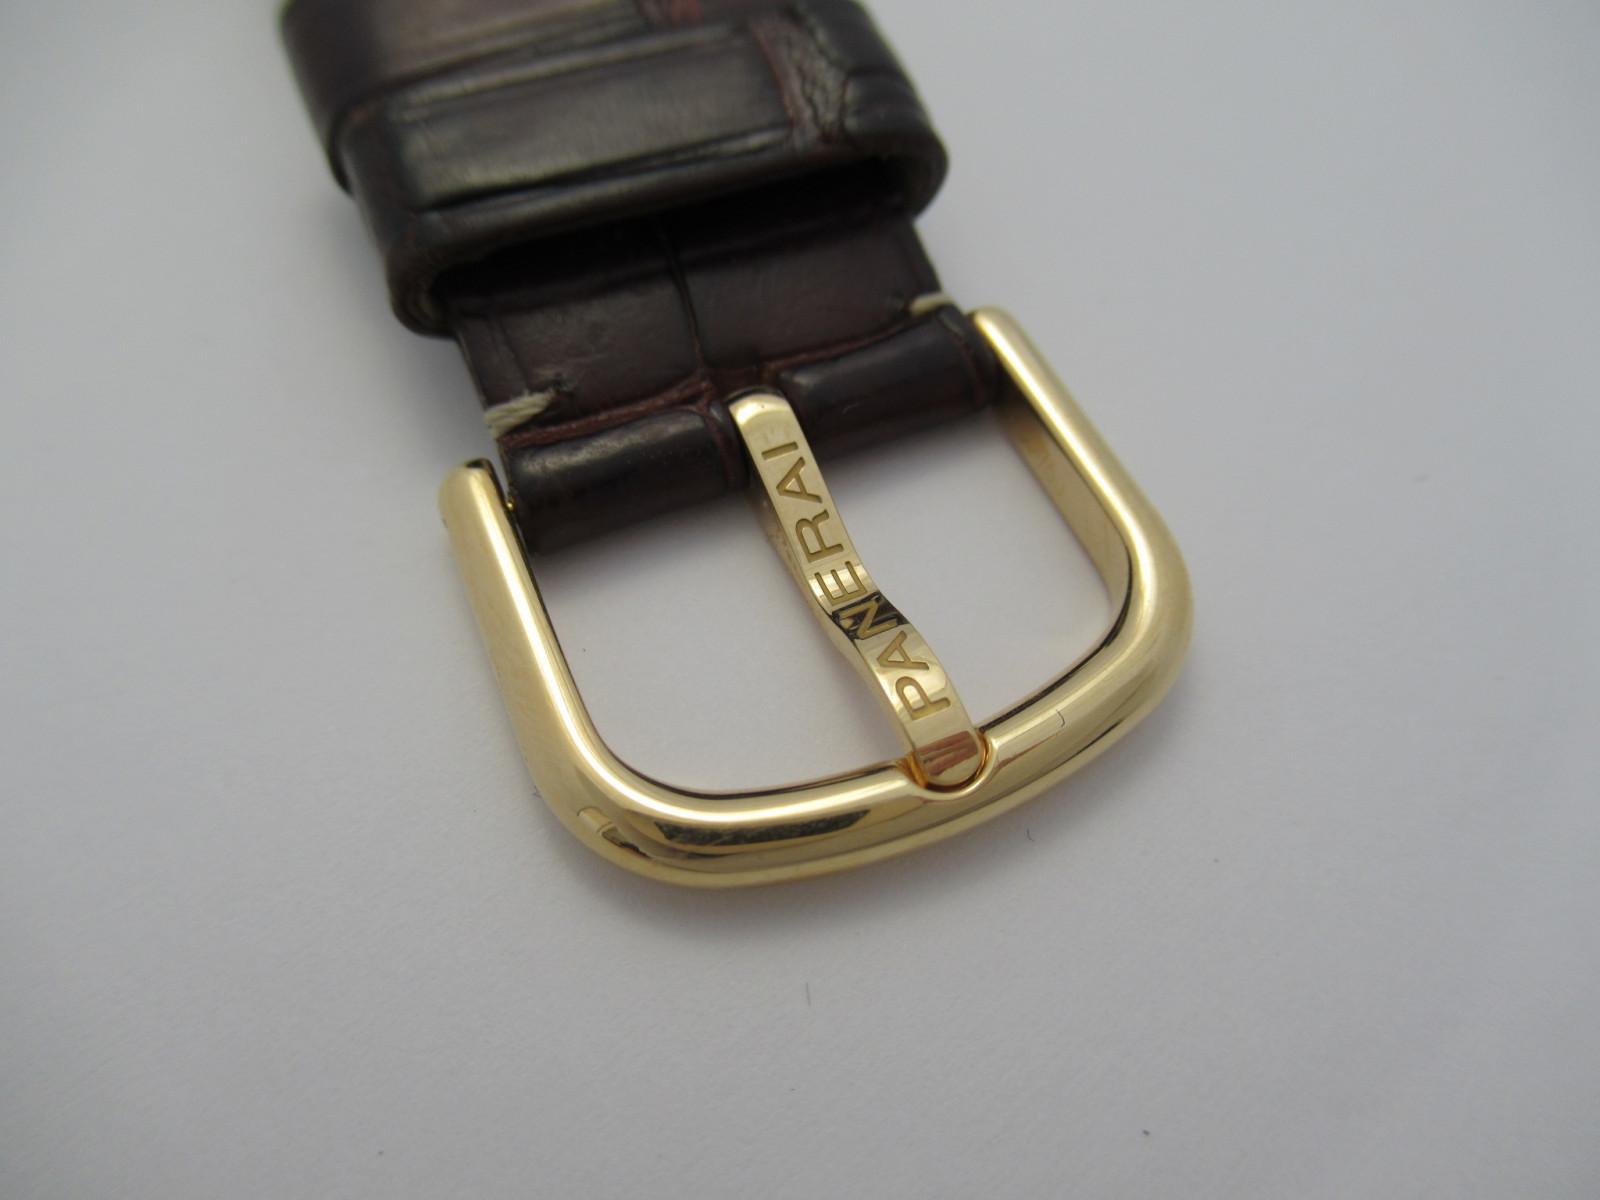 new style 73001 8ed2c Relojes Panerai Radiomir GMT Alarm oro rosa PAM00238 de ...